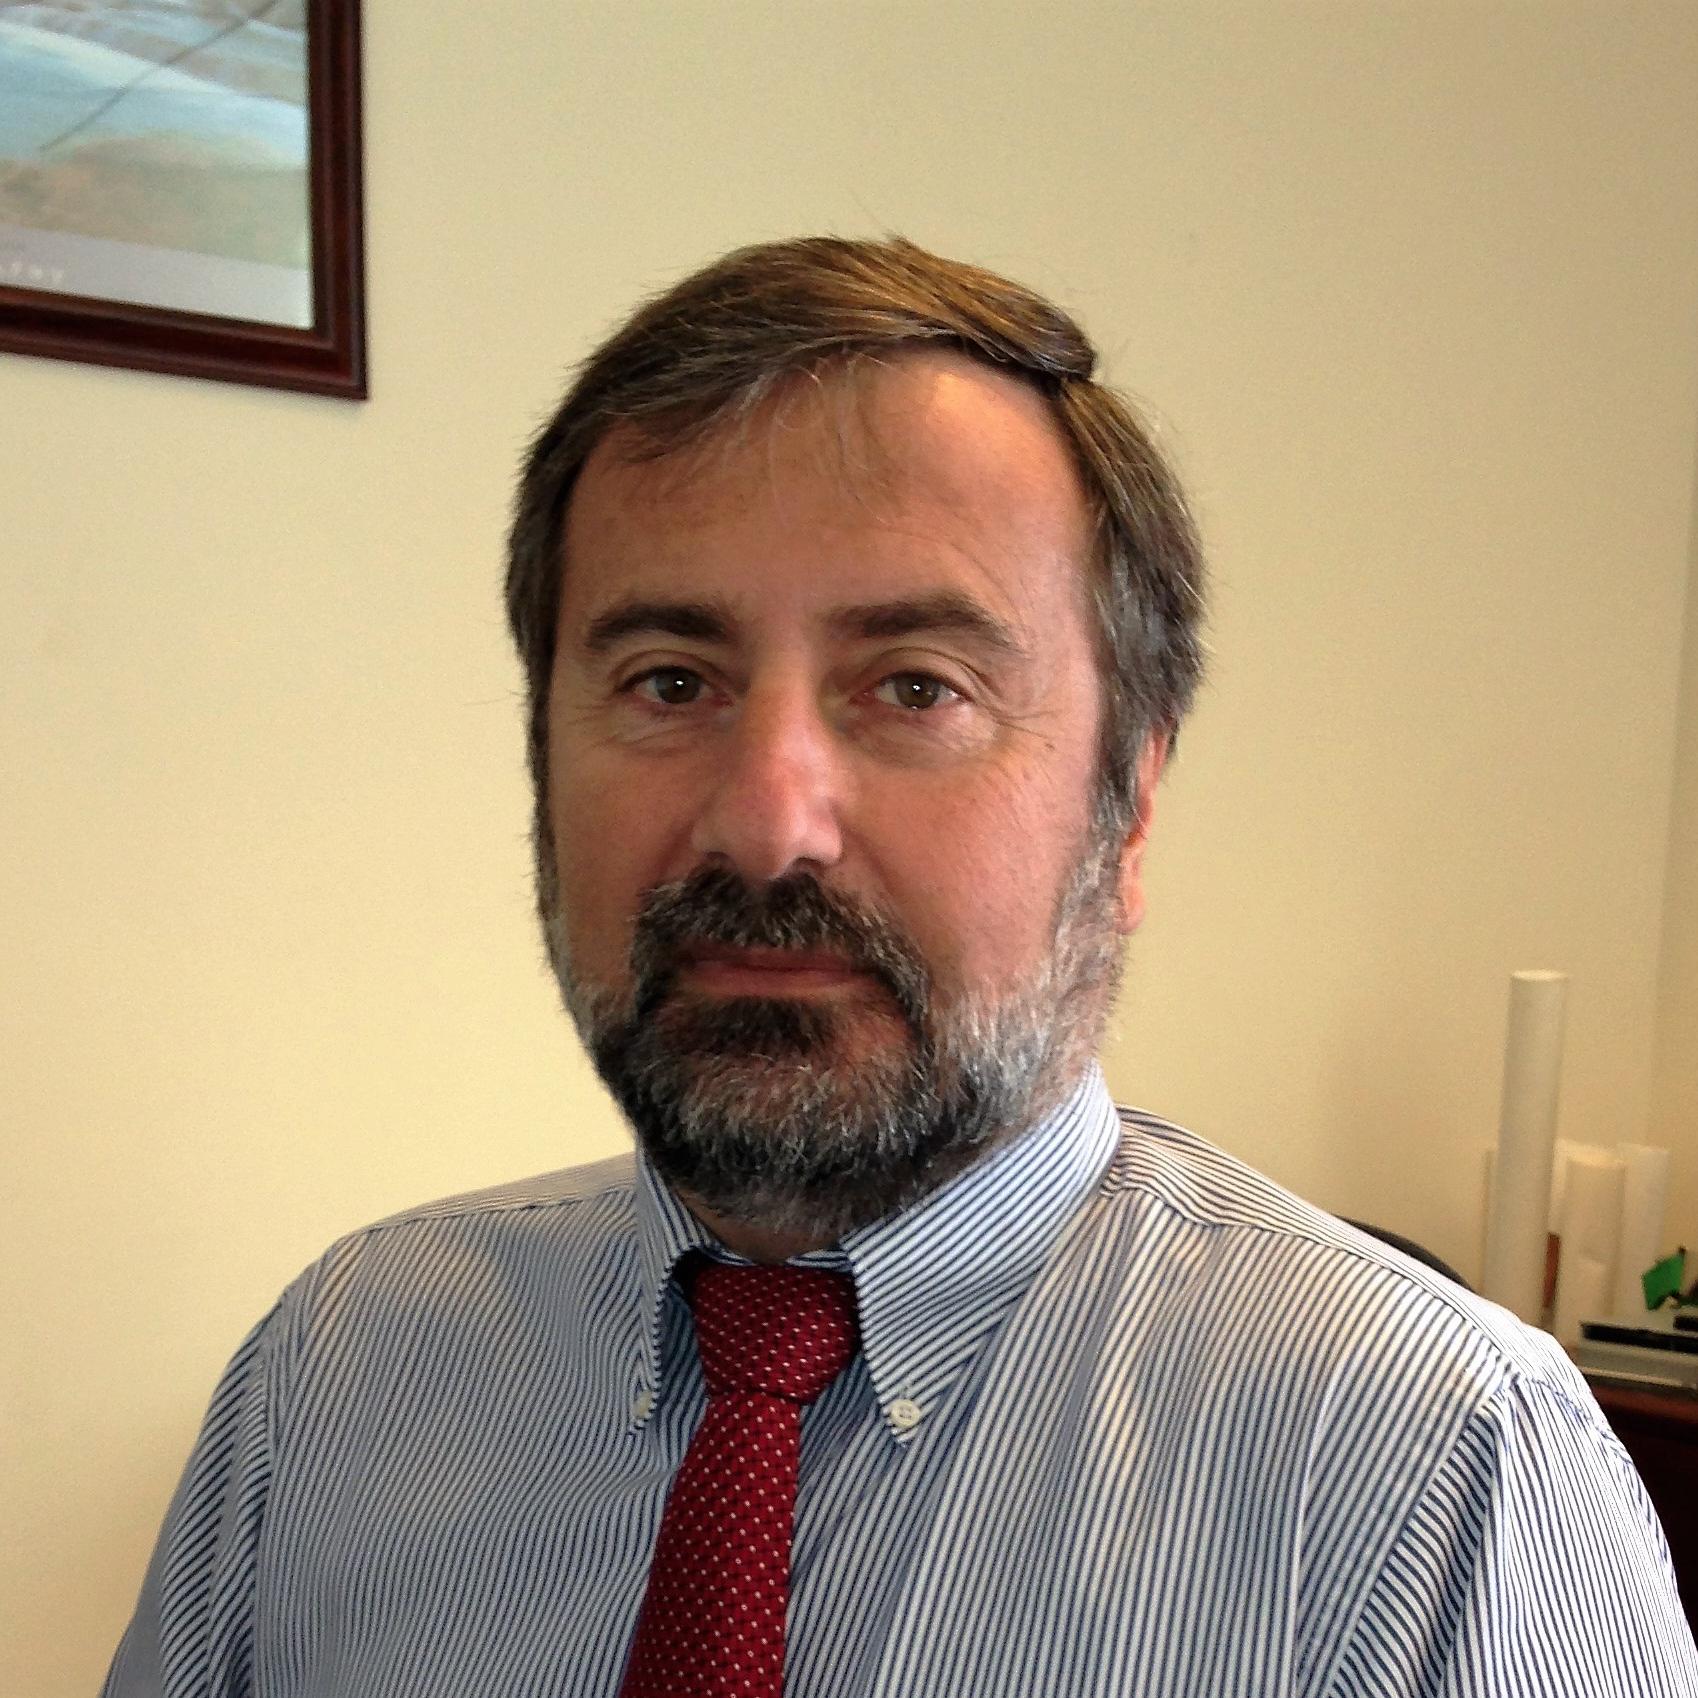 Paul Scheib, CISO at Boston Children's Hospital